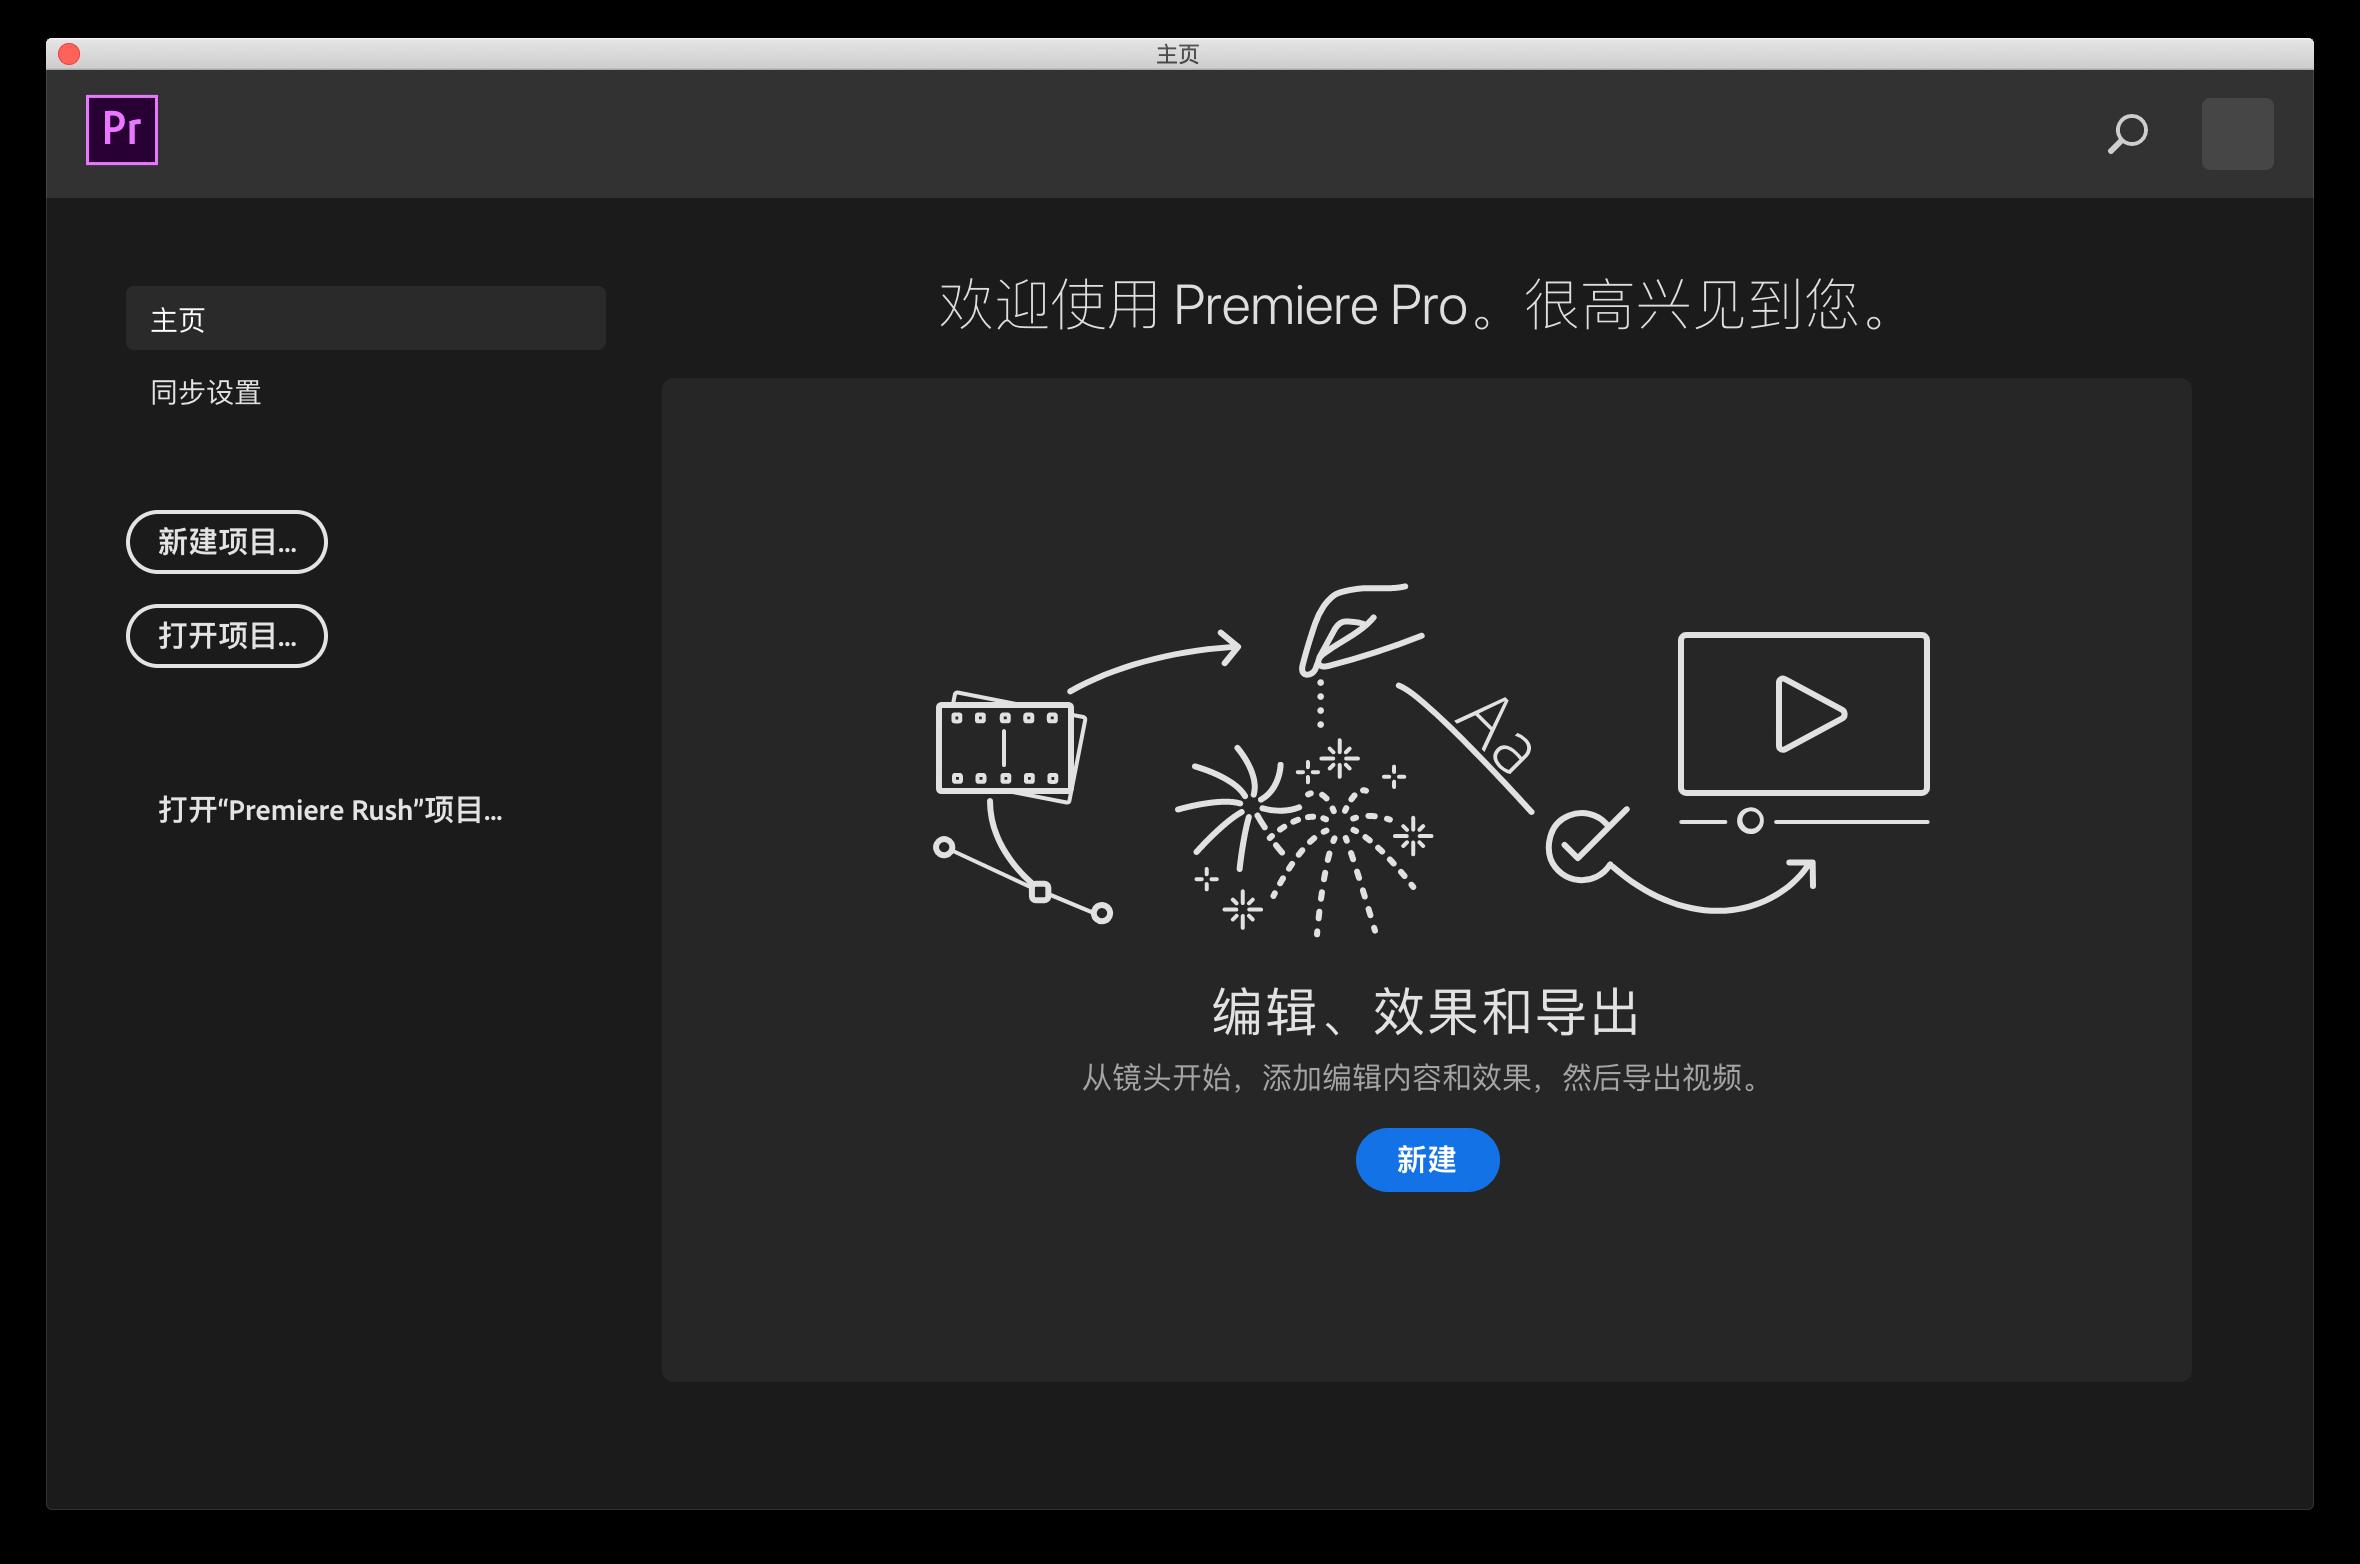 Adobe Premiere Pro 2020 for mac 14.9中文版